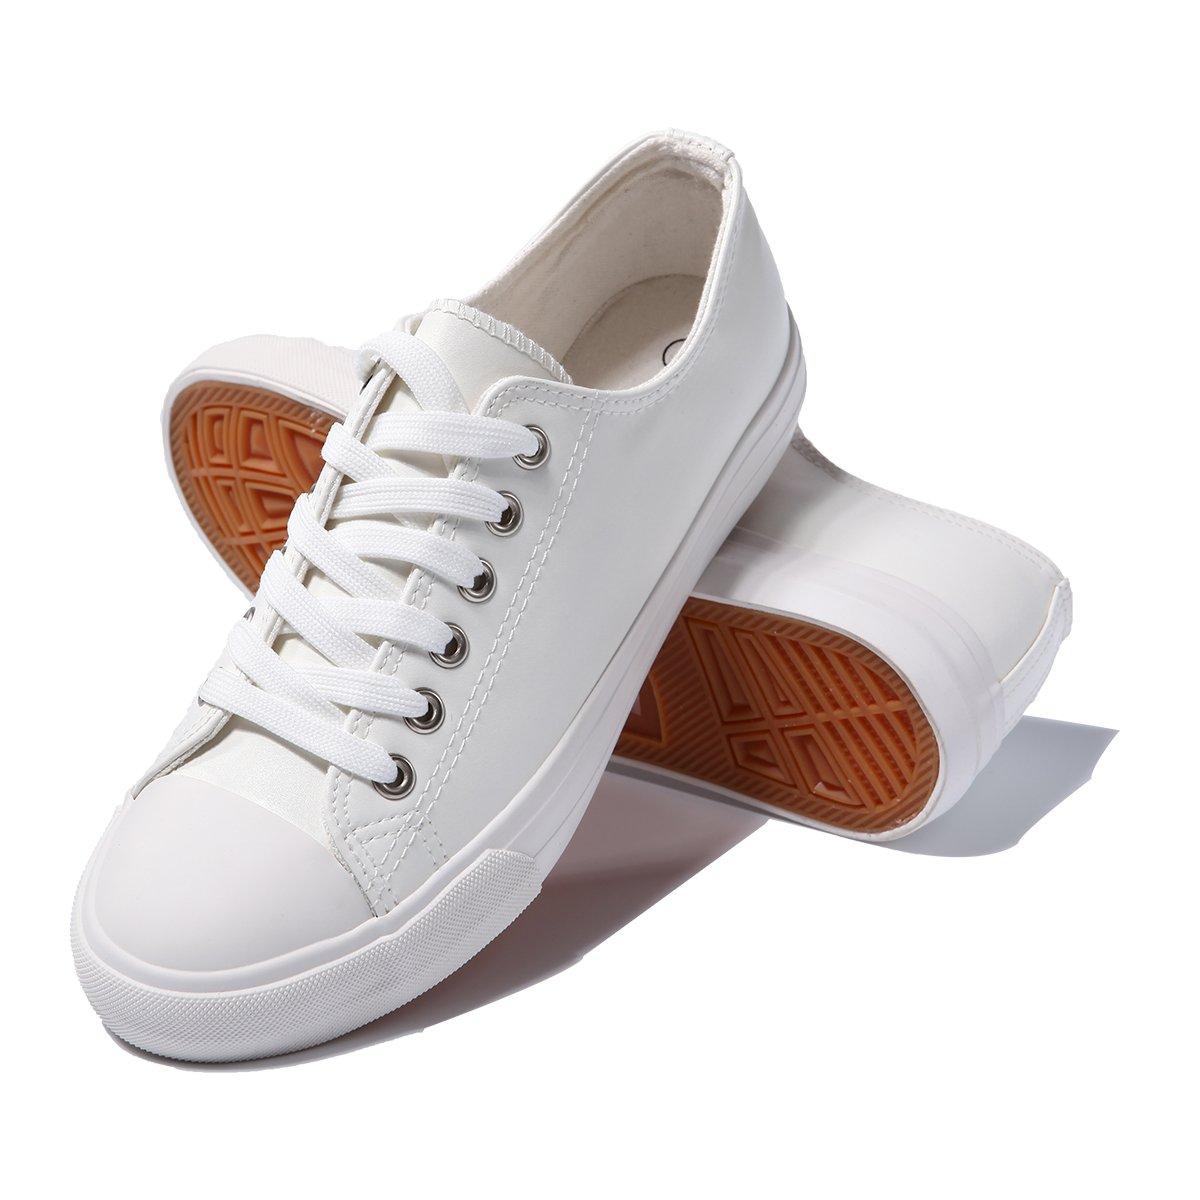 AOMAIS Womens PU Canvas Shoes Sneaker Low Top Lace up Fashion Walking Shoes (White,US7)